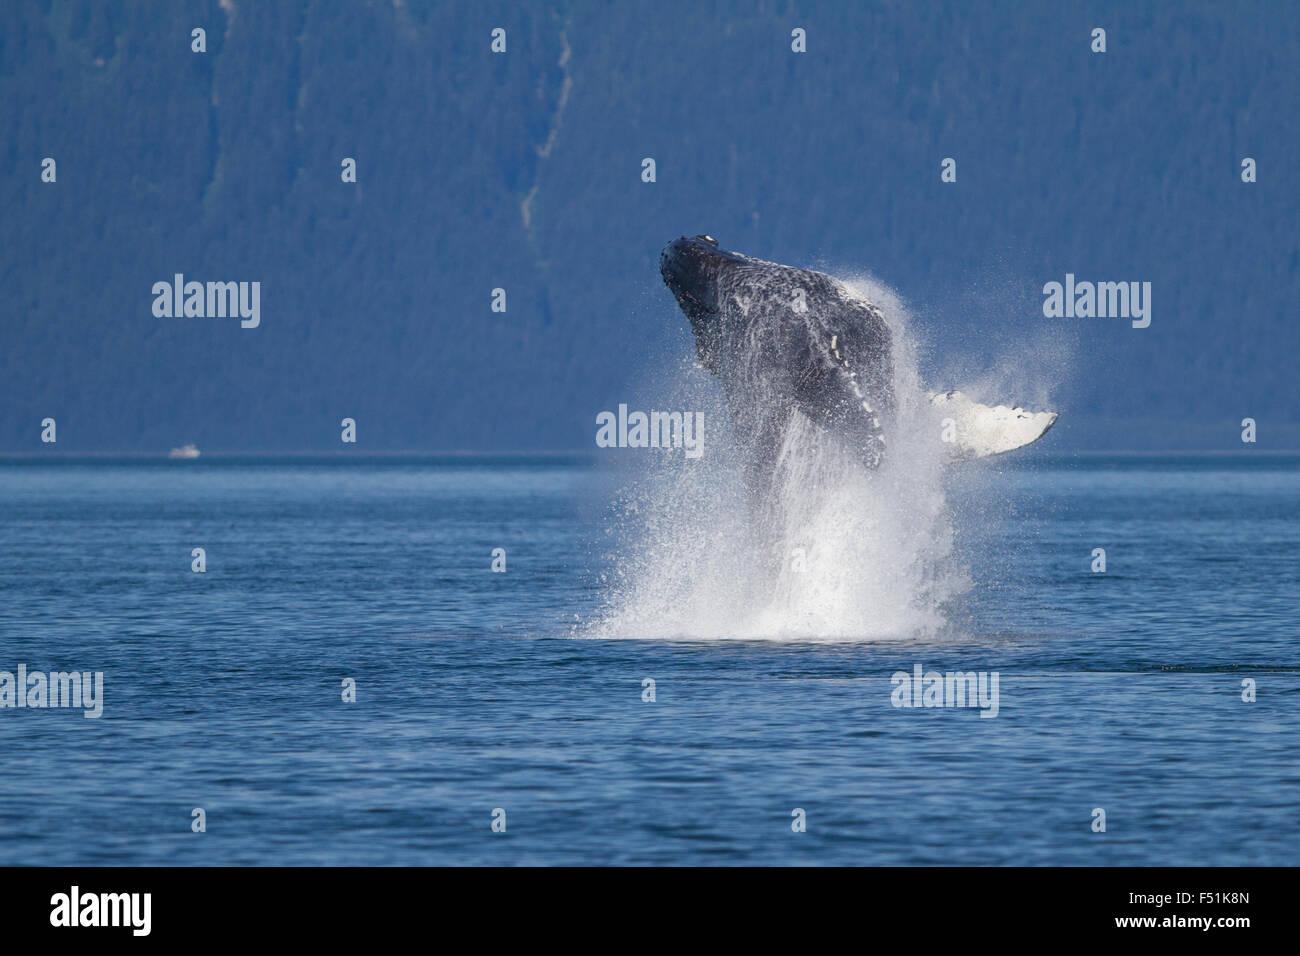 Humpback Whale breaching in Alaskan waters Stock Photo